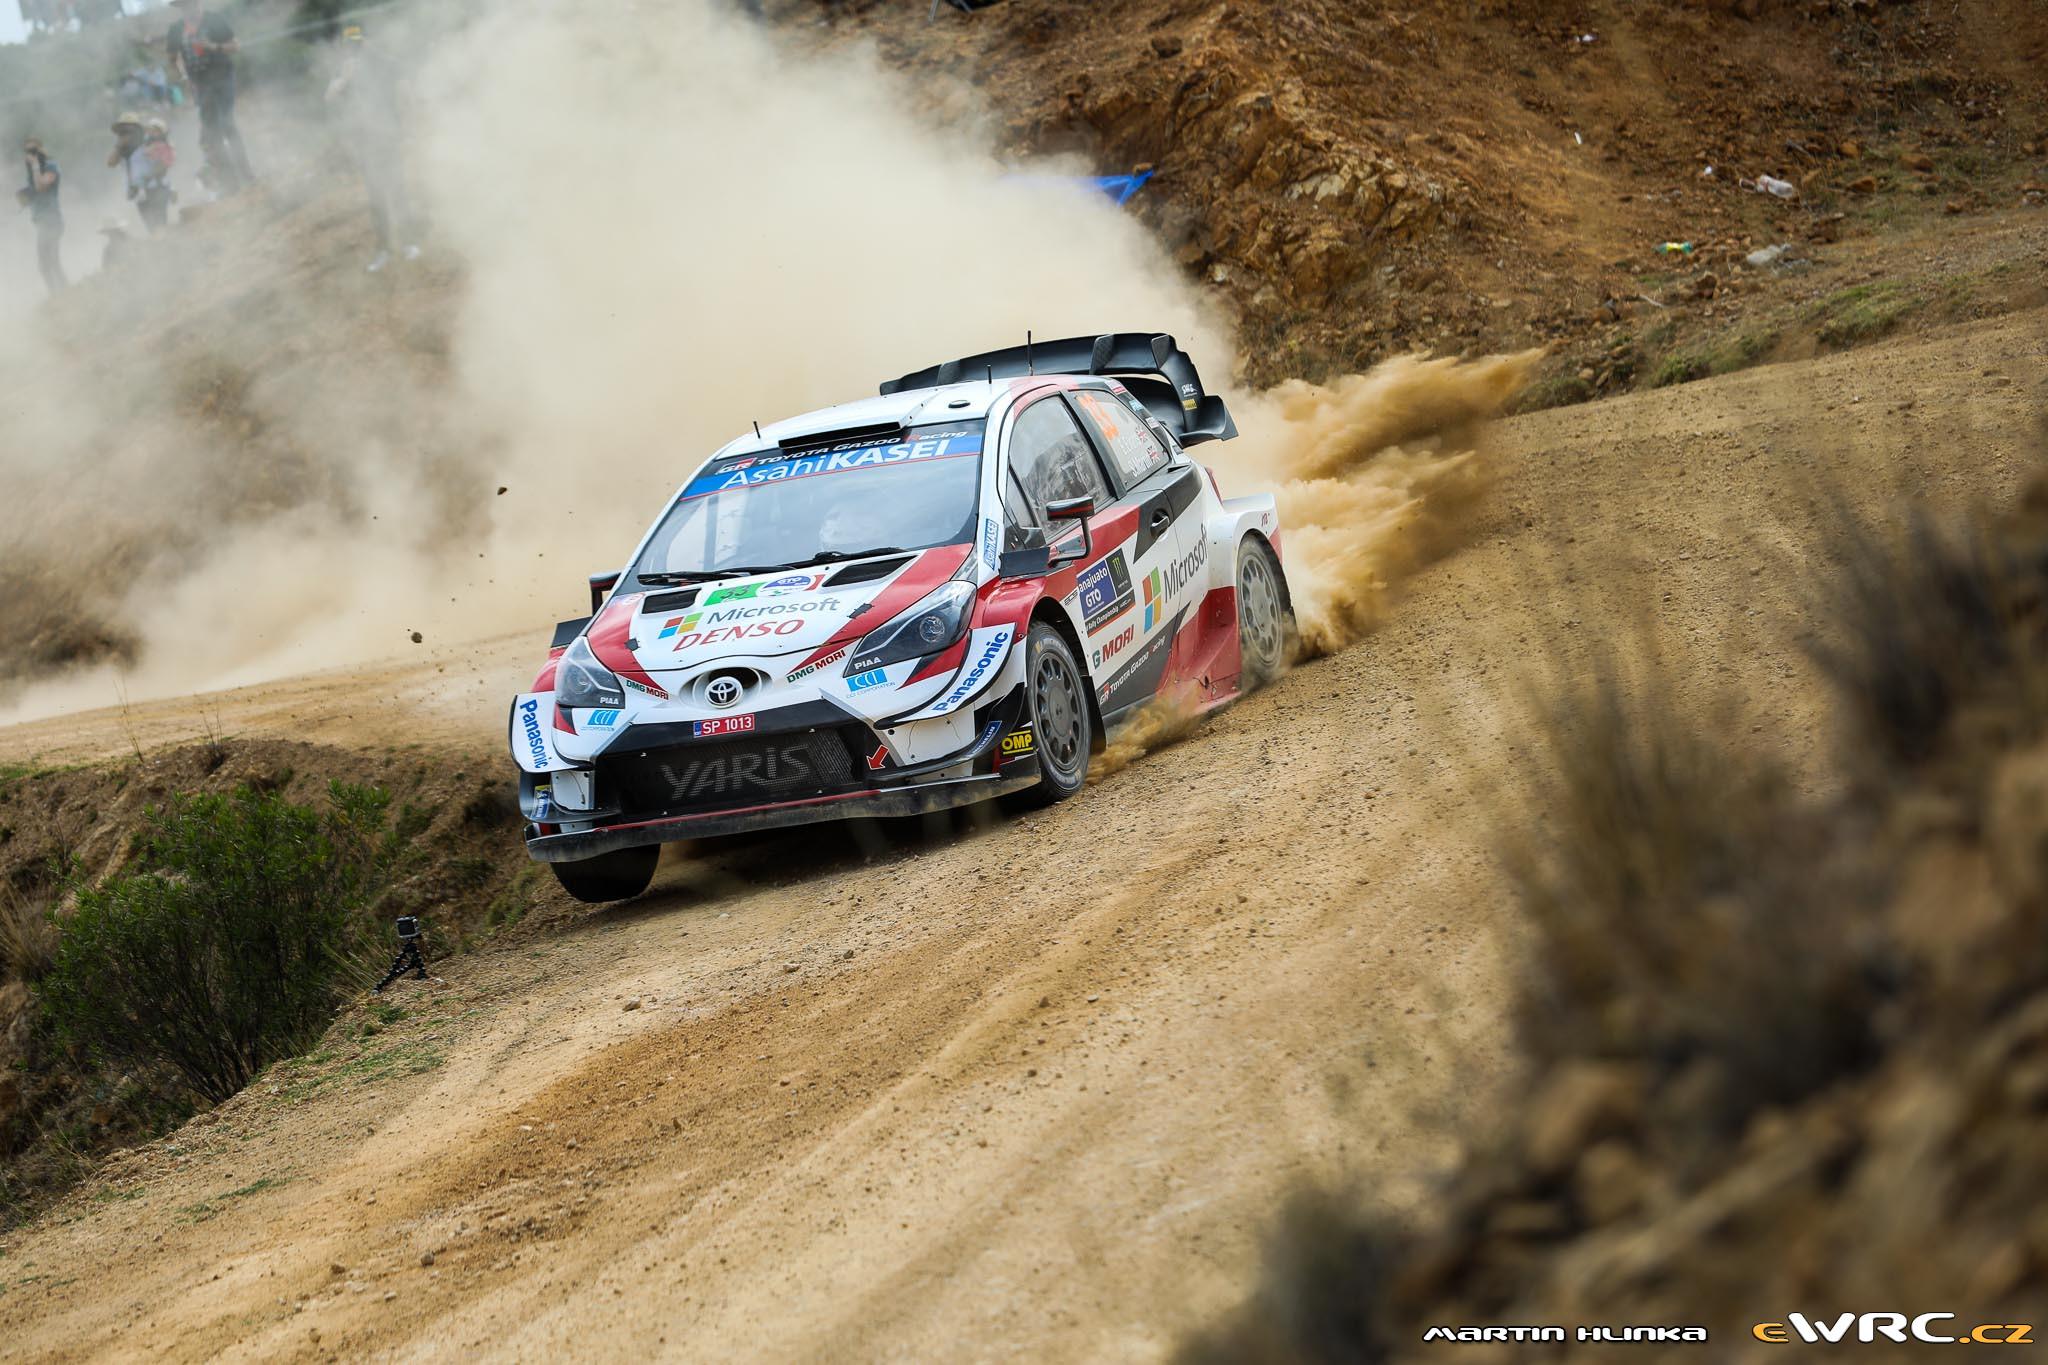 WRC: 17º Rallye Guanajuato Corona - México [12-15 Marzo] - Página 5 Mhl_9b2a0966